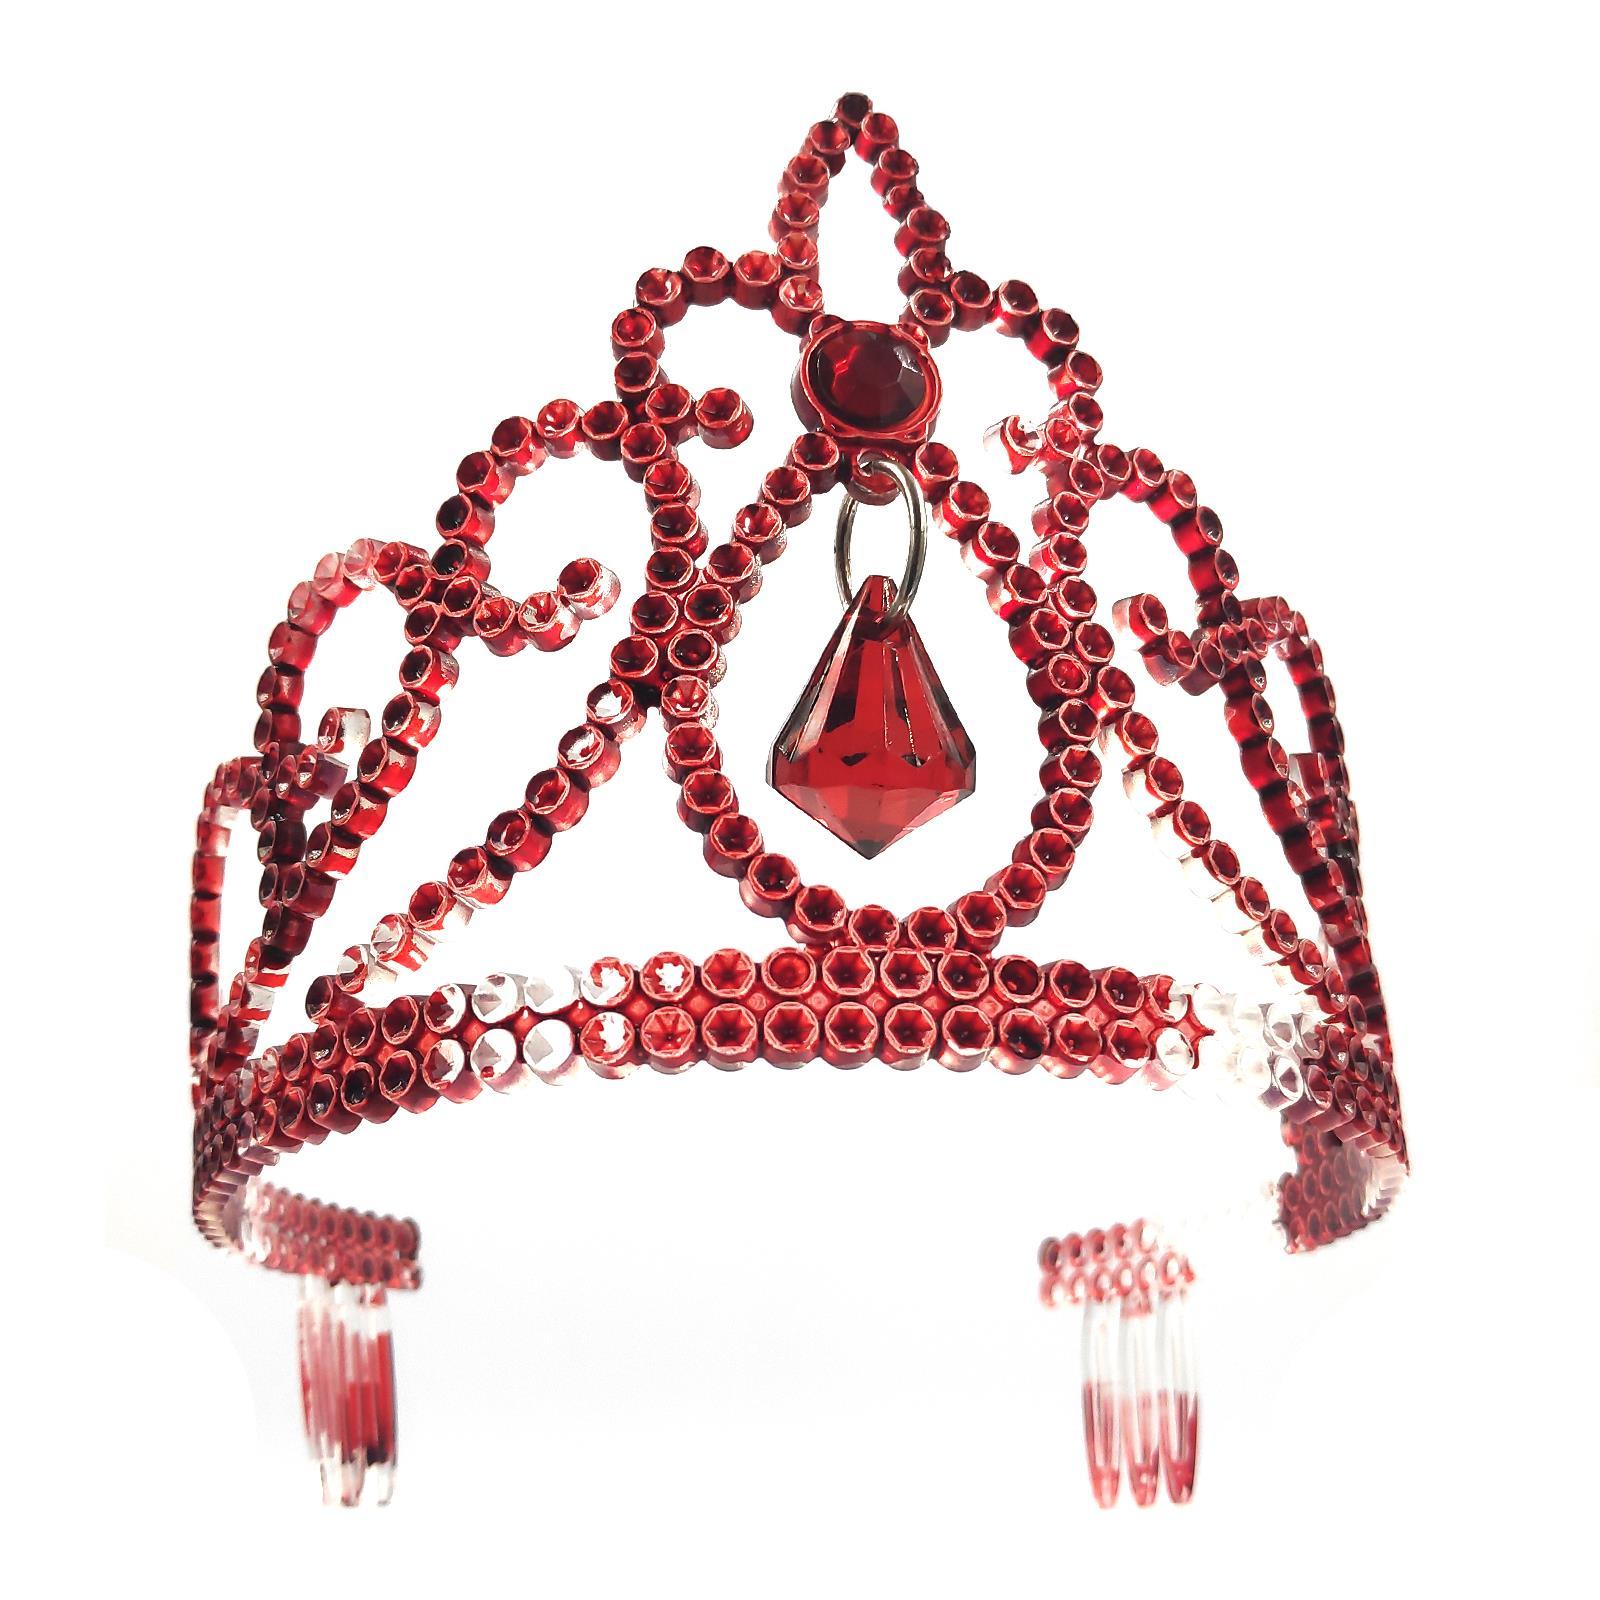 Xmas Costume Fancy Dress Tiara Headress Handcrafted Red Teardrop AB Halloween